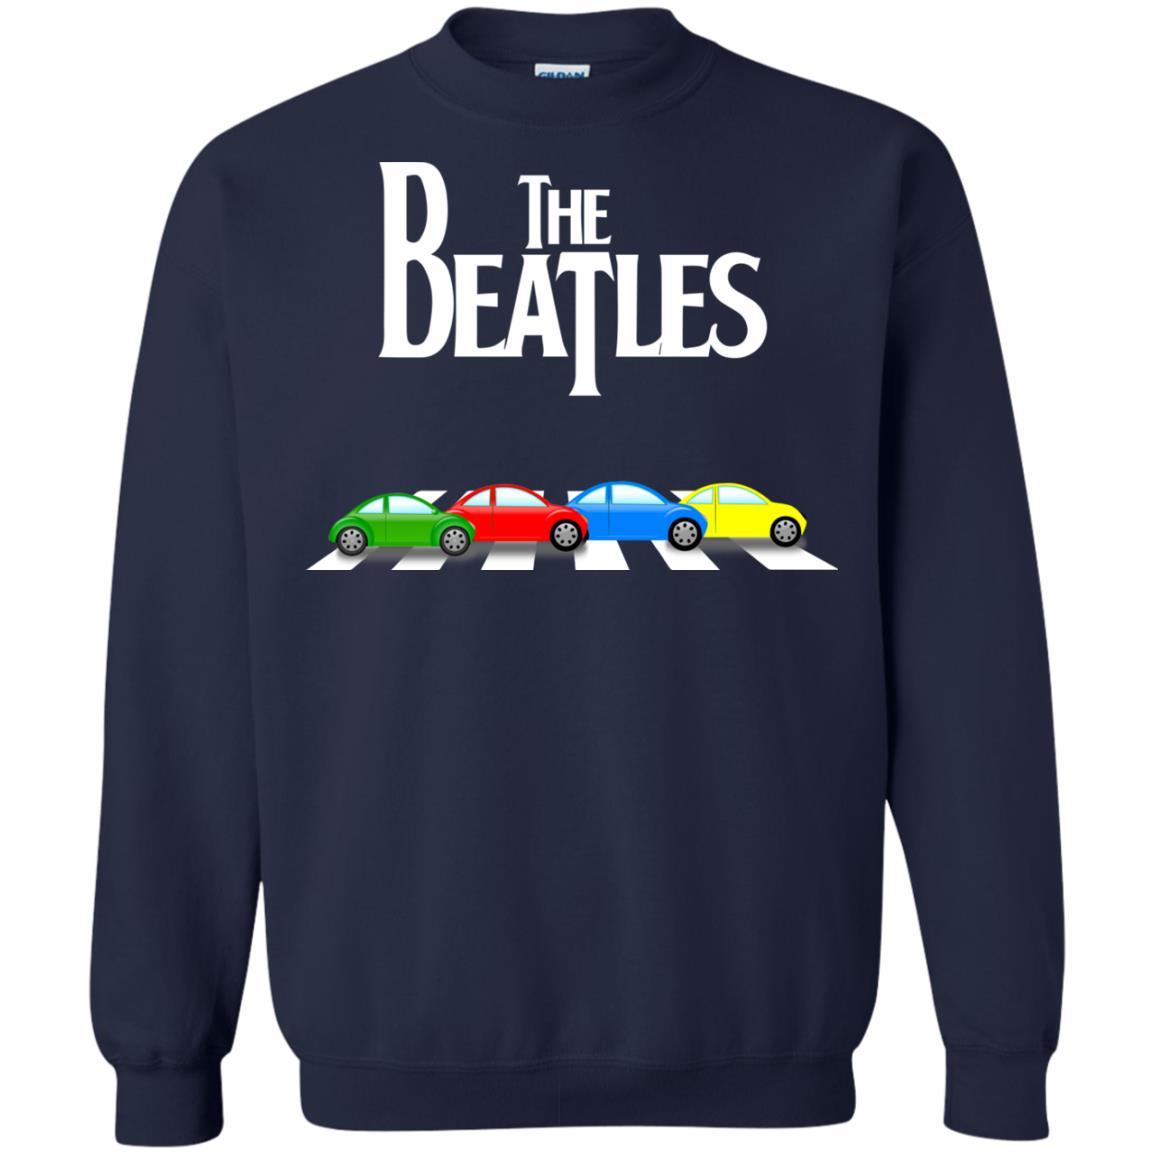 image 333 - The Beatles cars shirt, hoodie, tank